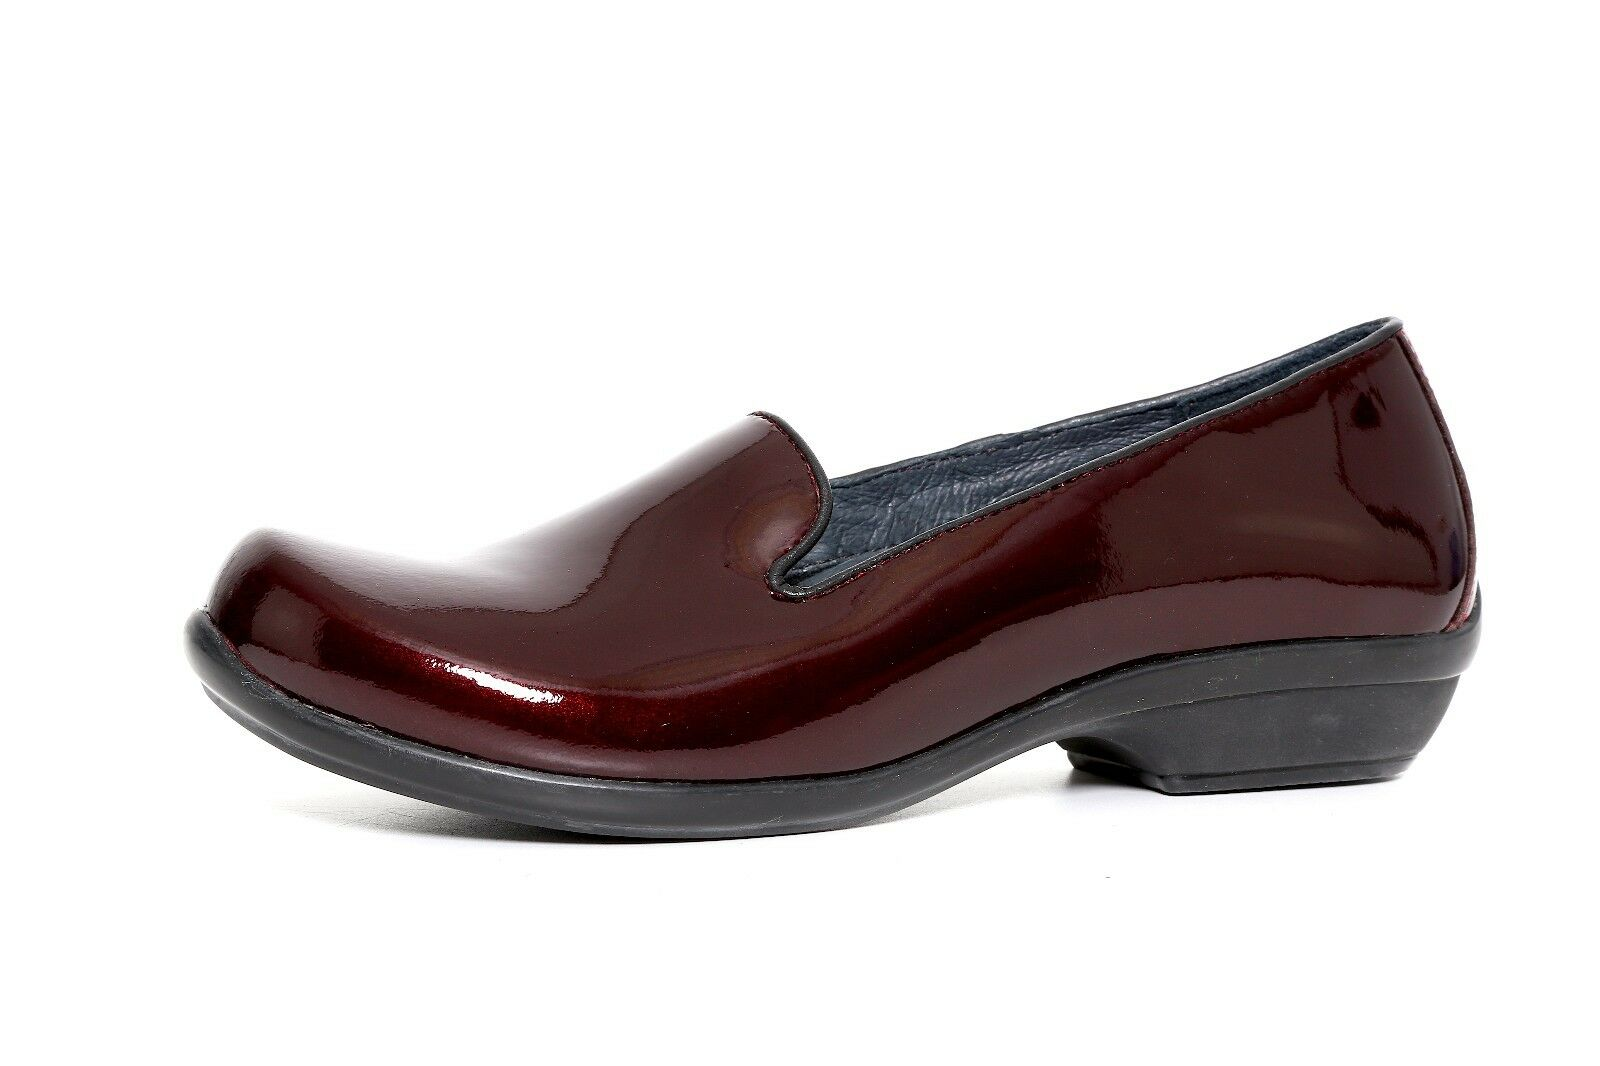 Dansko Women's Burgundy Patent Leather Slip On Shoes 3391 Size 36